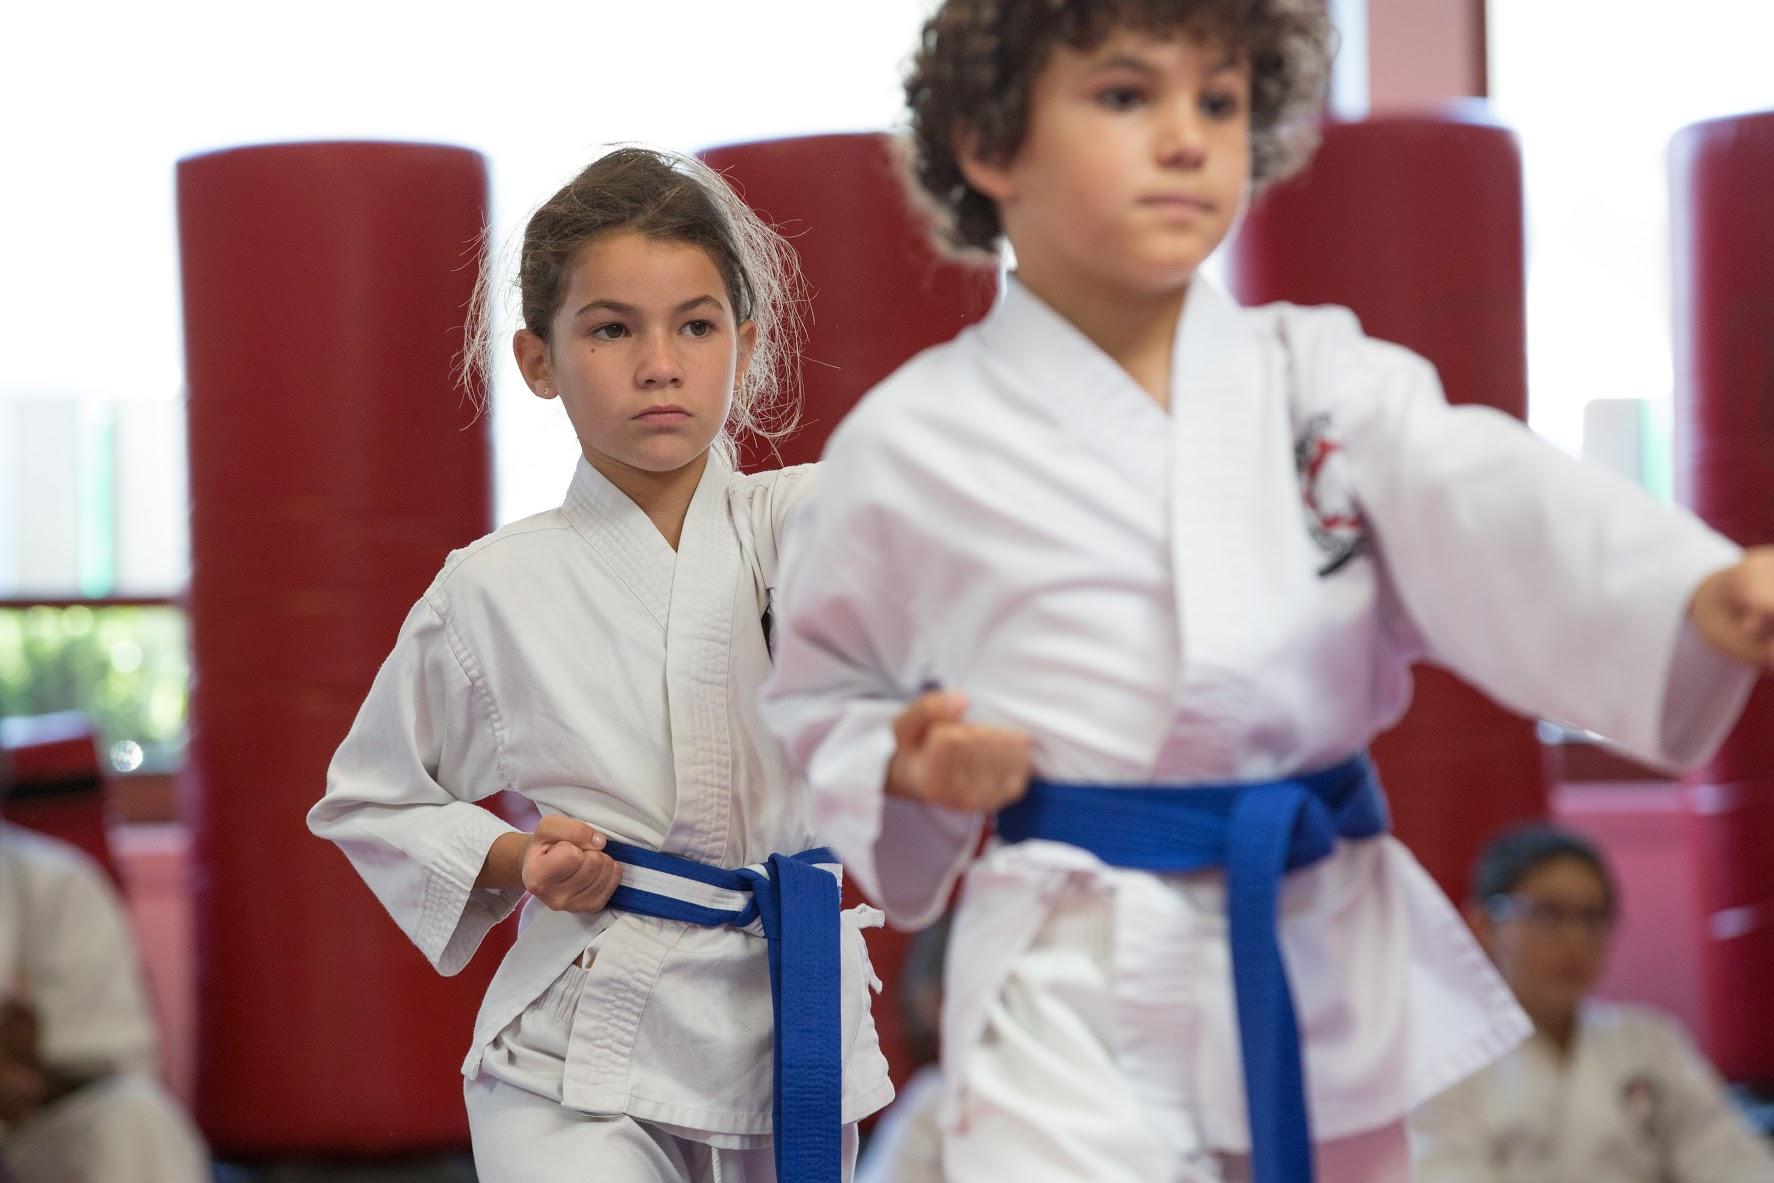 Kids Karate Little Girl (Good Angle).JPG